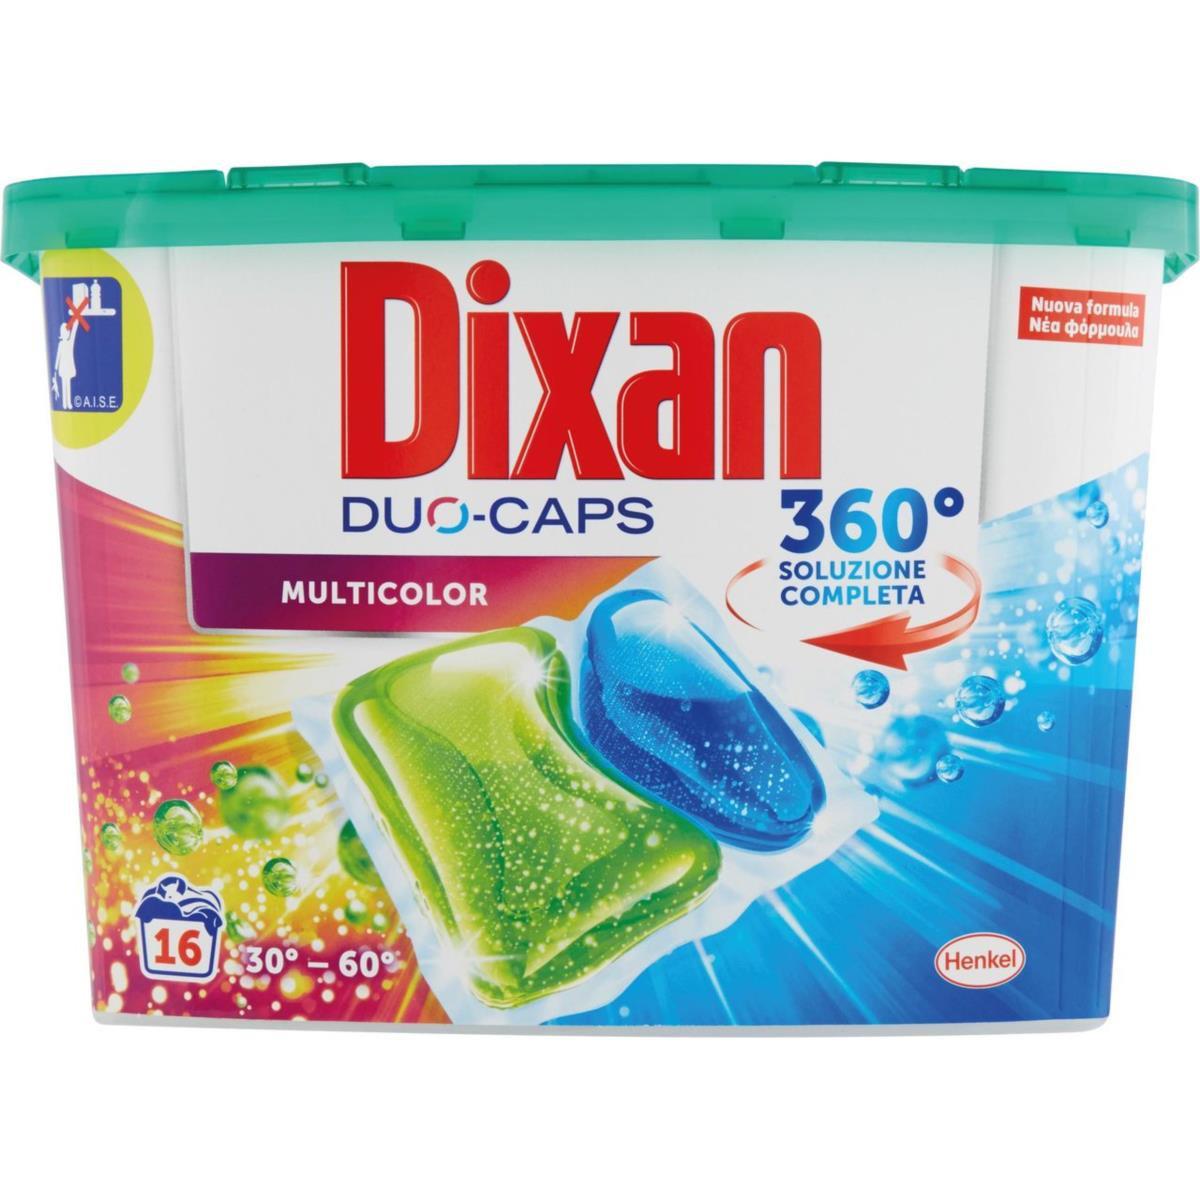 Dixan Duo-Caps Multicolor 16 lavaggi